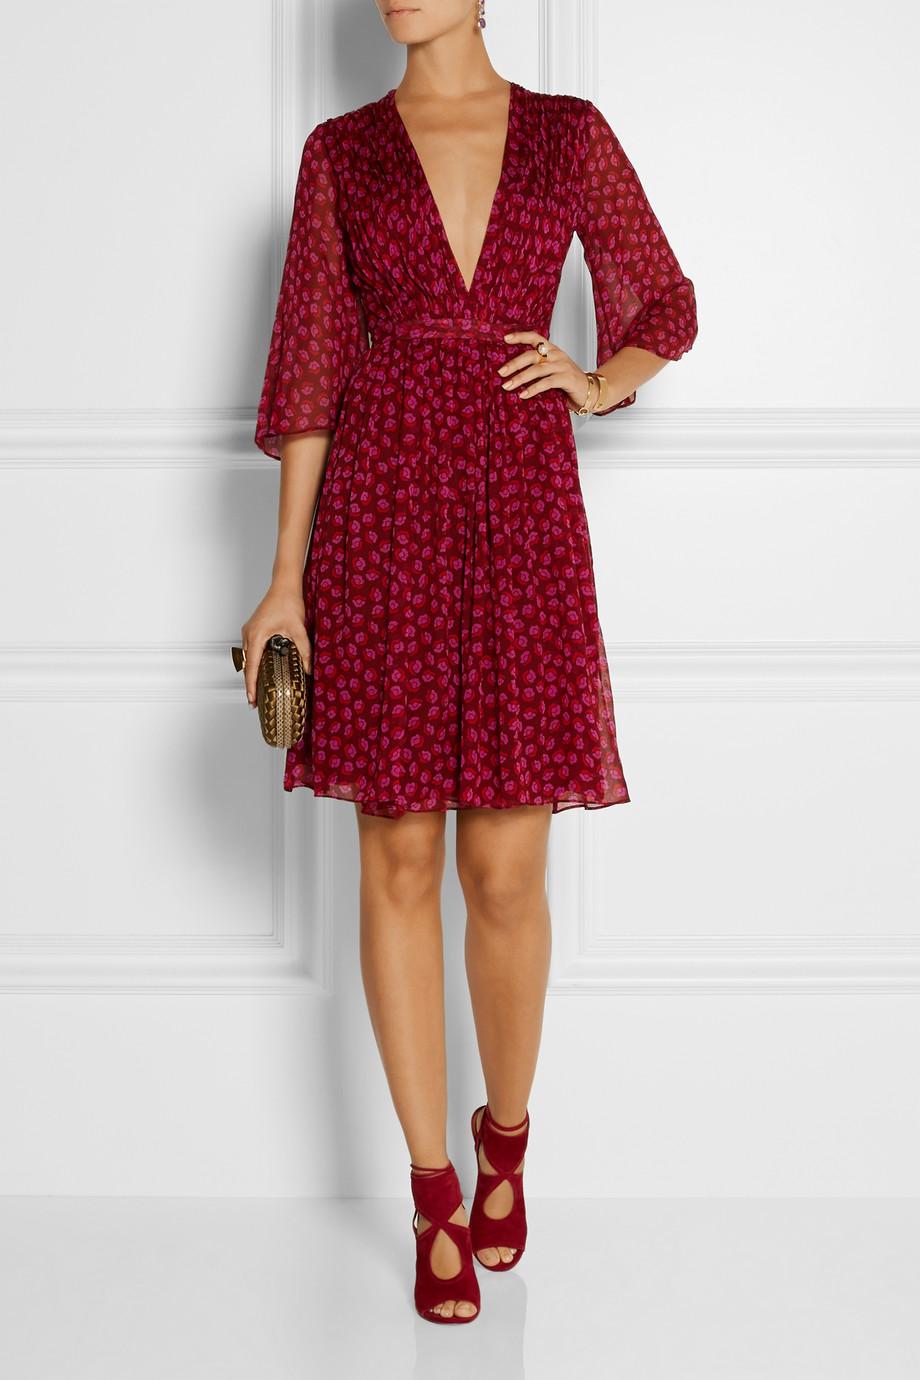 Diane von Furstenberg printed silk-georgette wrap dress | Fancy Friday - Diane von Furstenberg Wrap Dresses | Style and Cheek's Favorite Blog Posts of 2014